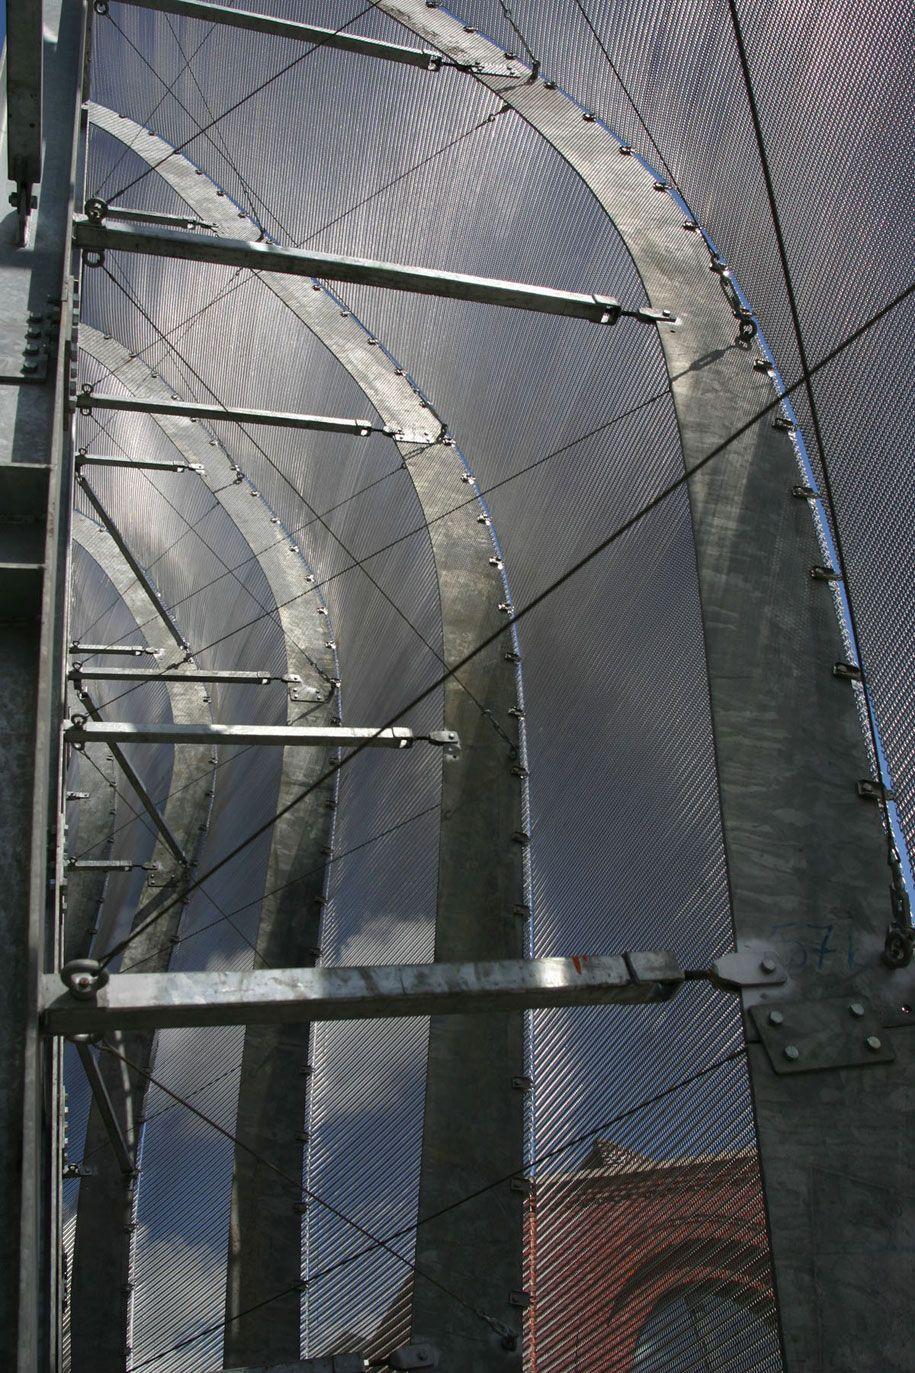 Maison folie lille france nox architects gkd escale 5 x 1 metal fabrics fas dy - Cabinet d architecture lille ...